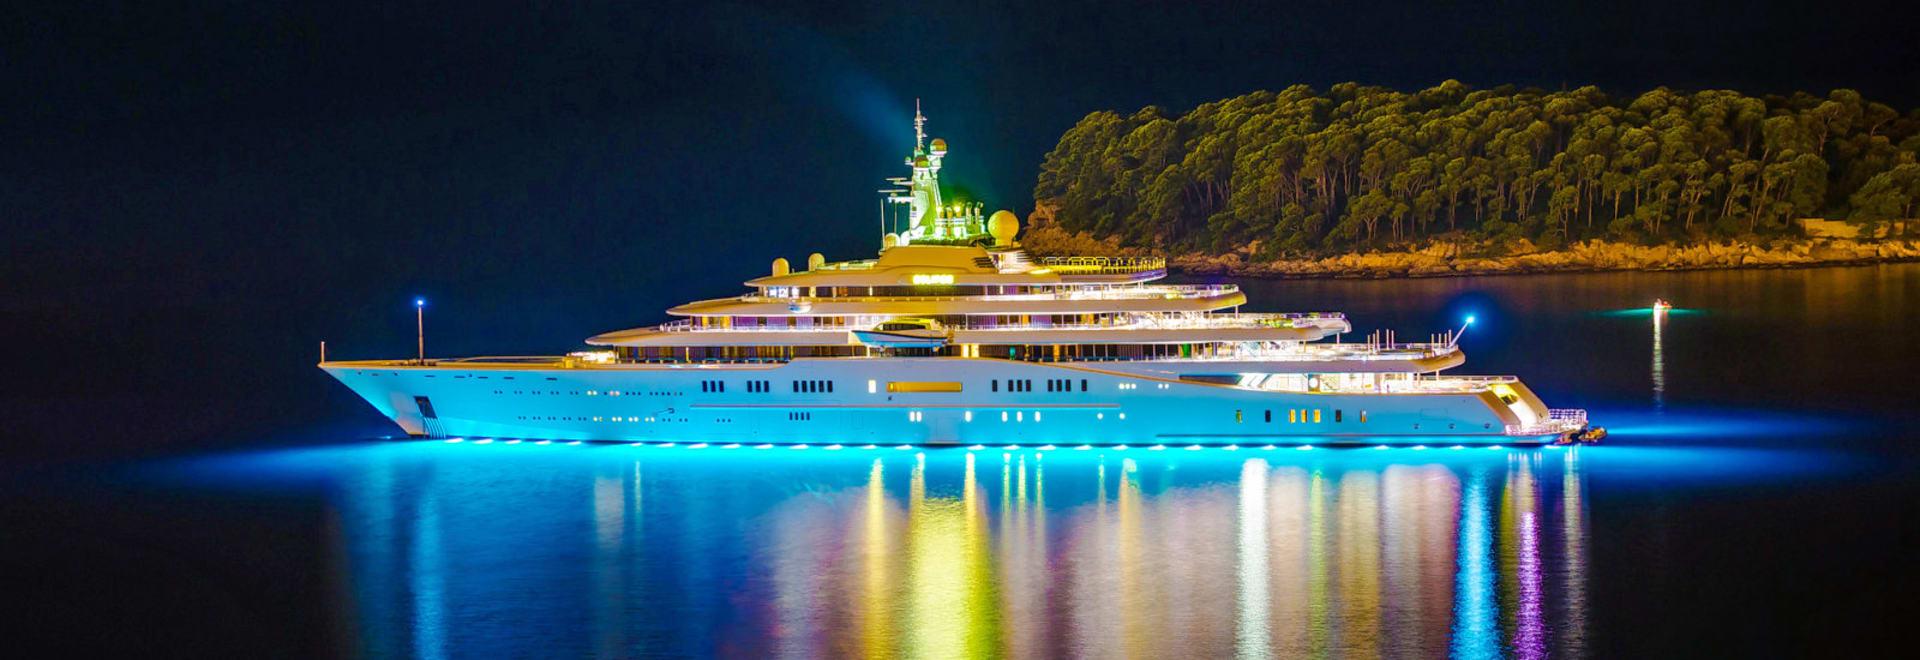 Download-cruise-ship-wallpaper-hd-2.jpg